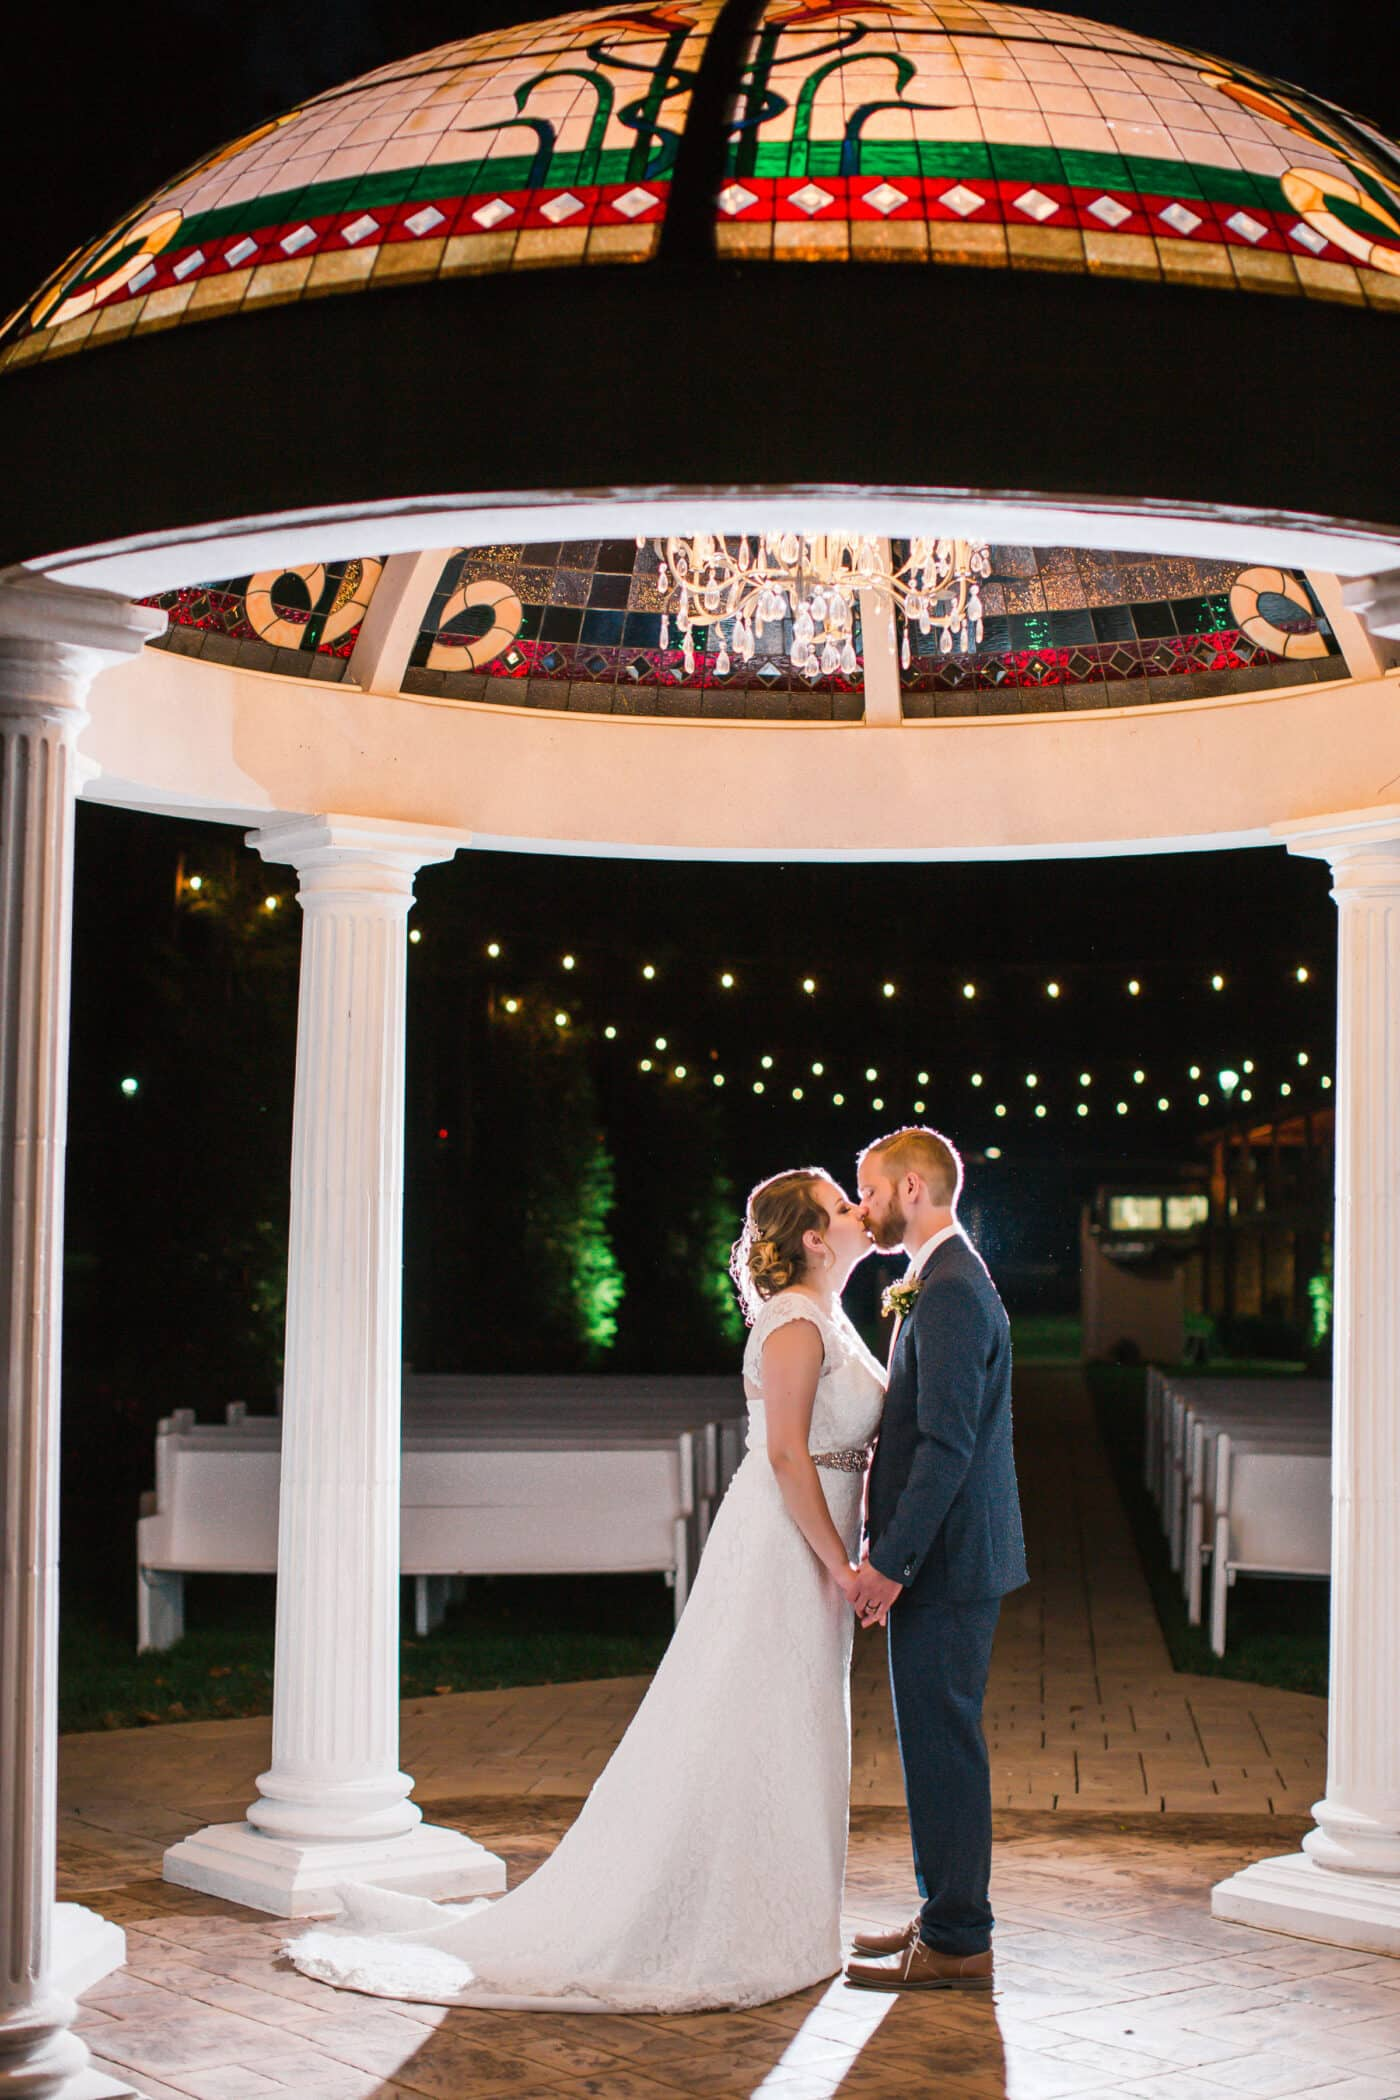 Selecting Your Virginia Wedding Venue | Entwined Events | Venue: Bella Rose Plantation in Lynchburg, VA | Photo Credit: Heather Kidd Photography